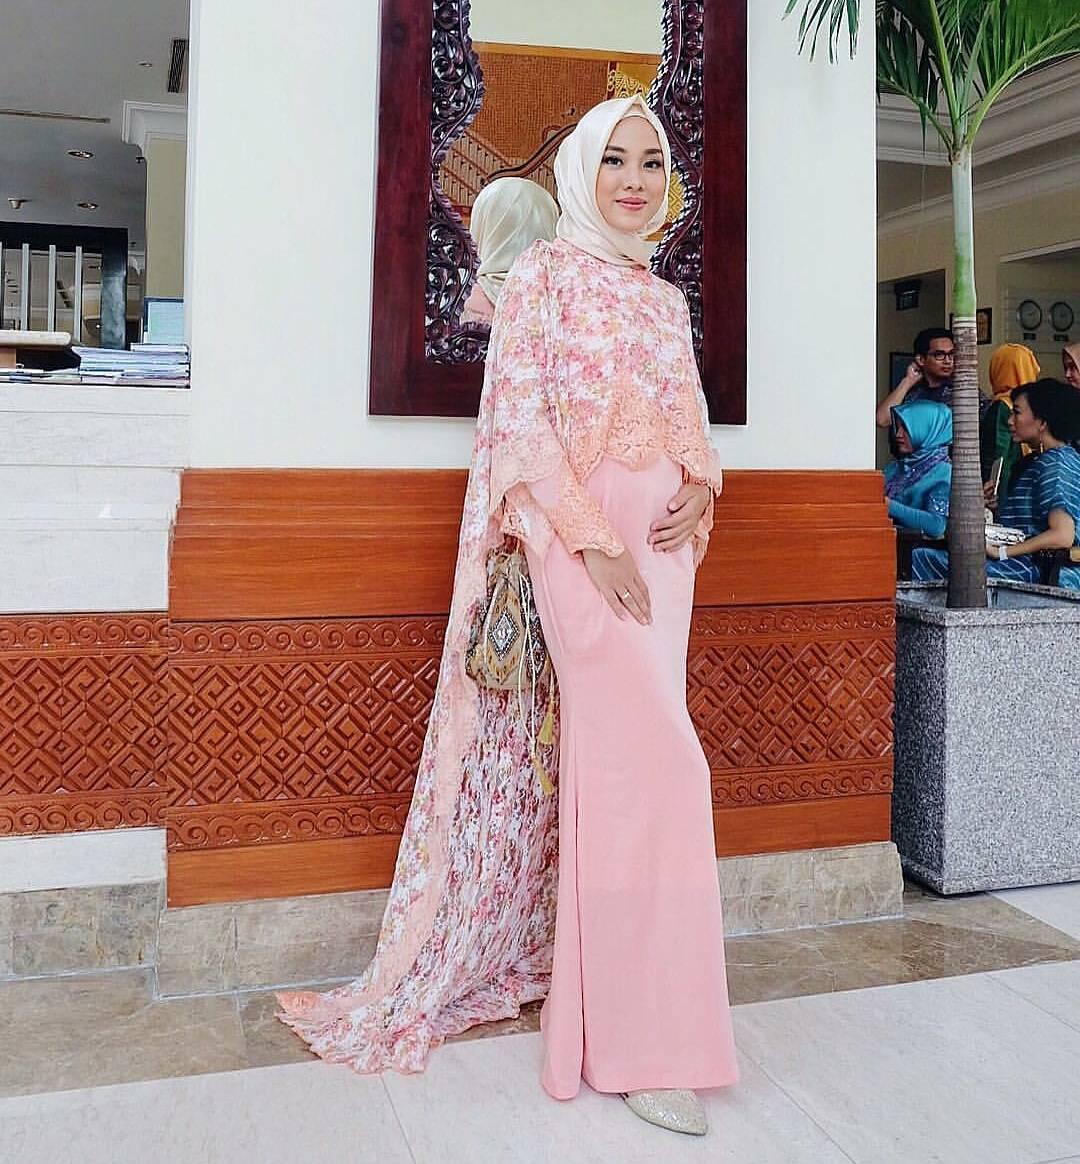 Model Gaun Pesta Modern Terbaru 2017 - Ragam Fashion